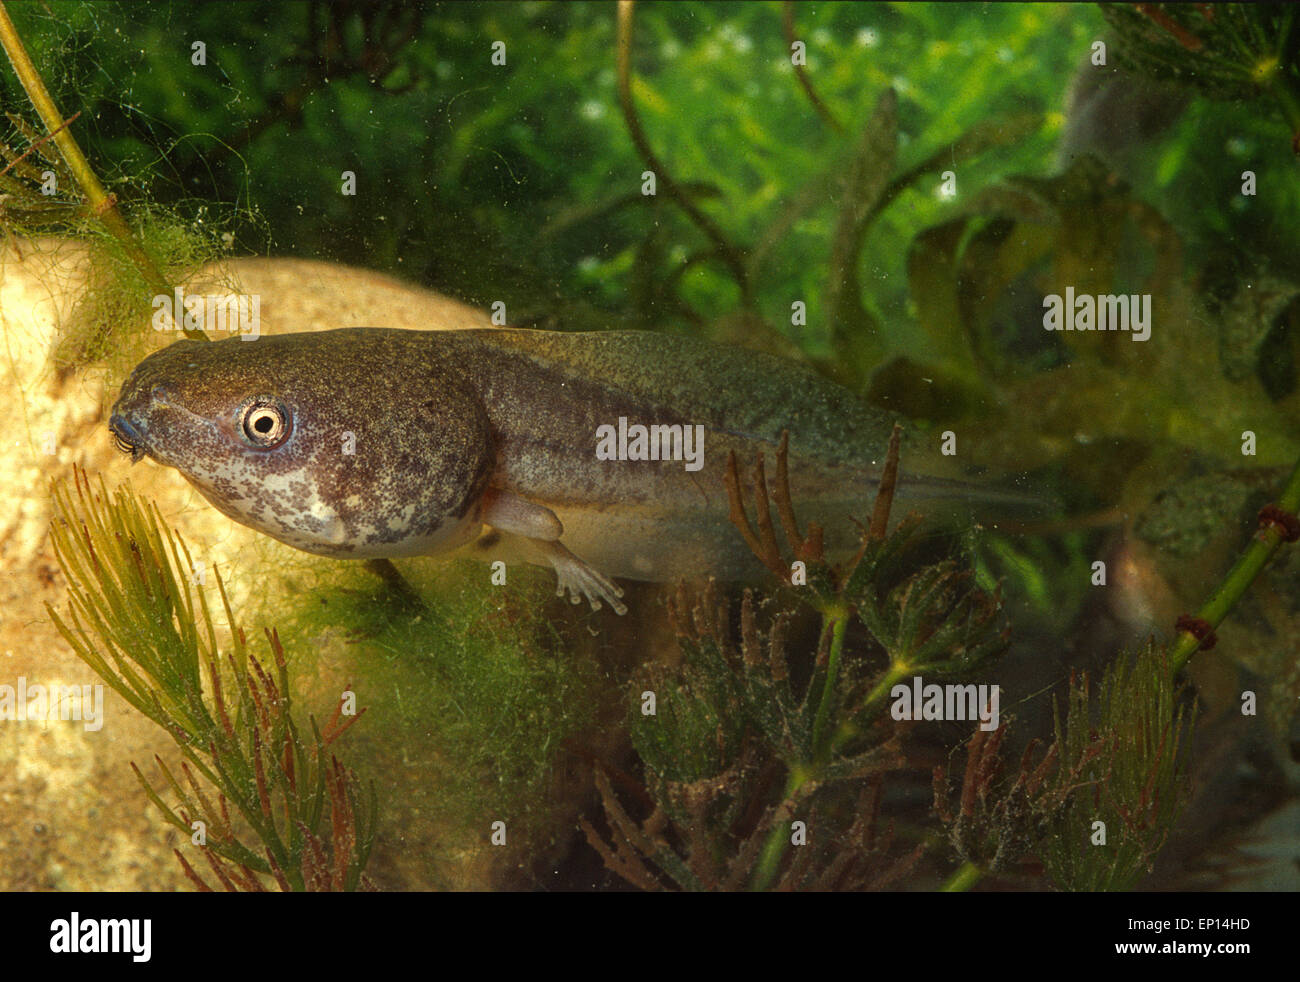 Tadpole of  Java Whipping Frog Rhacophorus leucomystax, Rhacophoridae, Asia - Stock Image